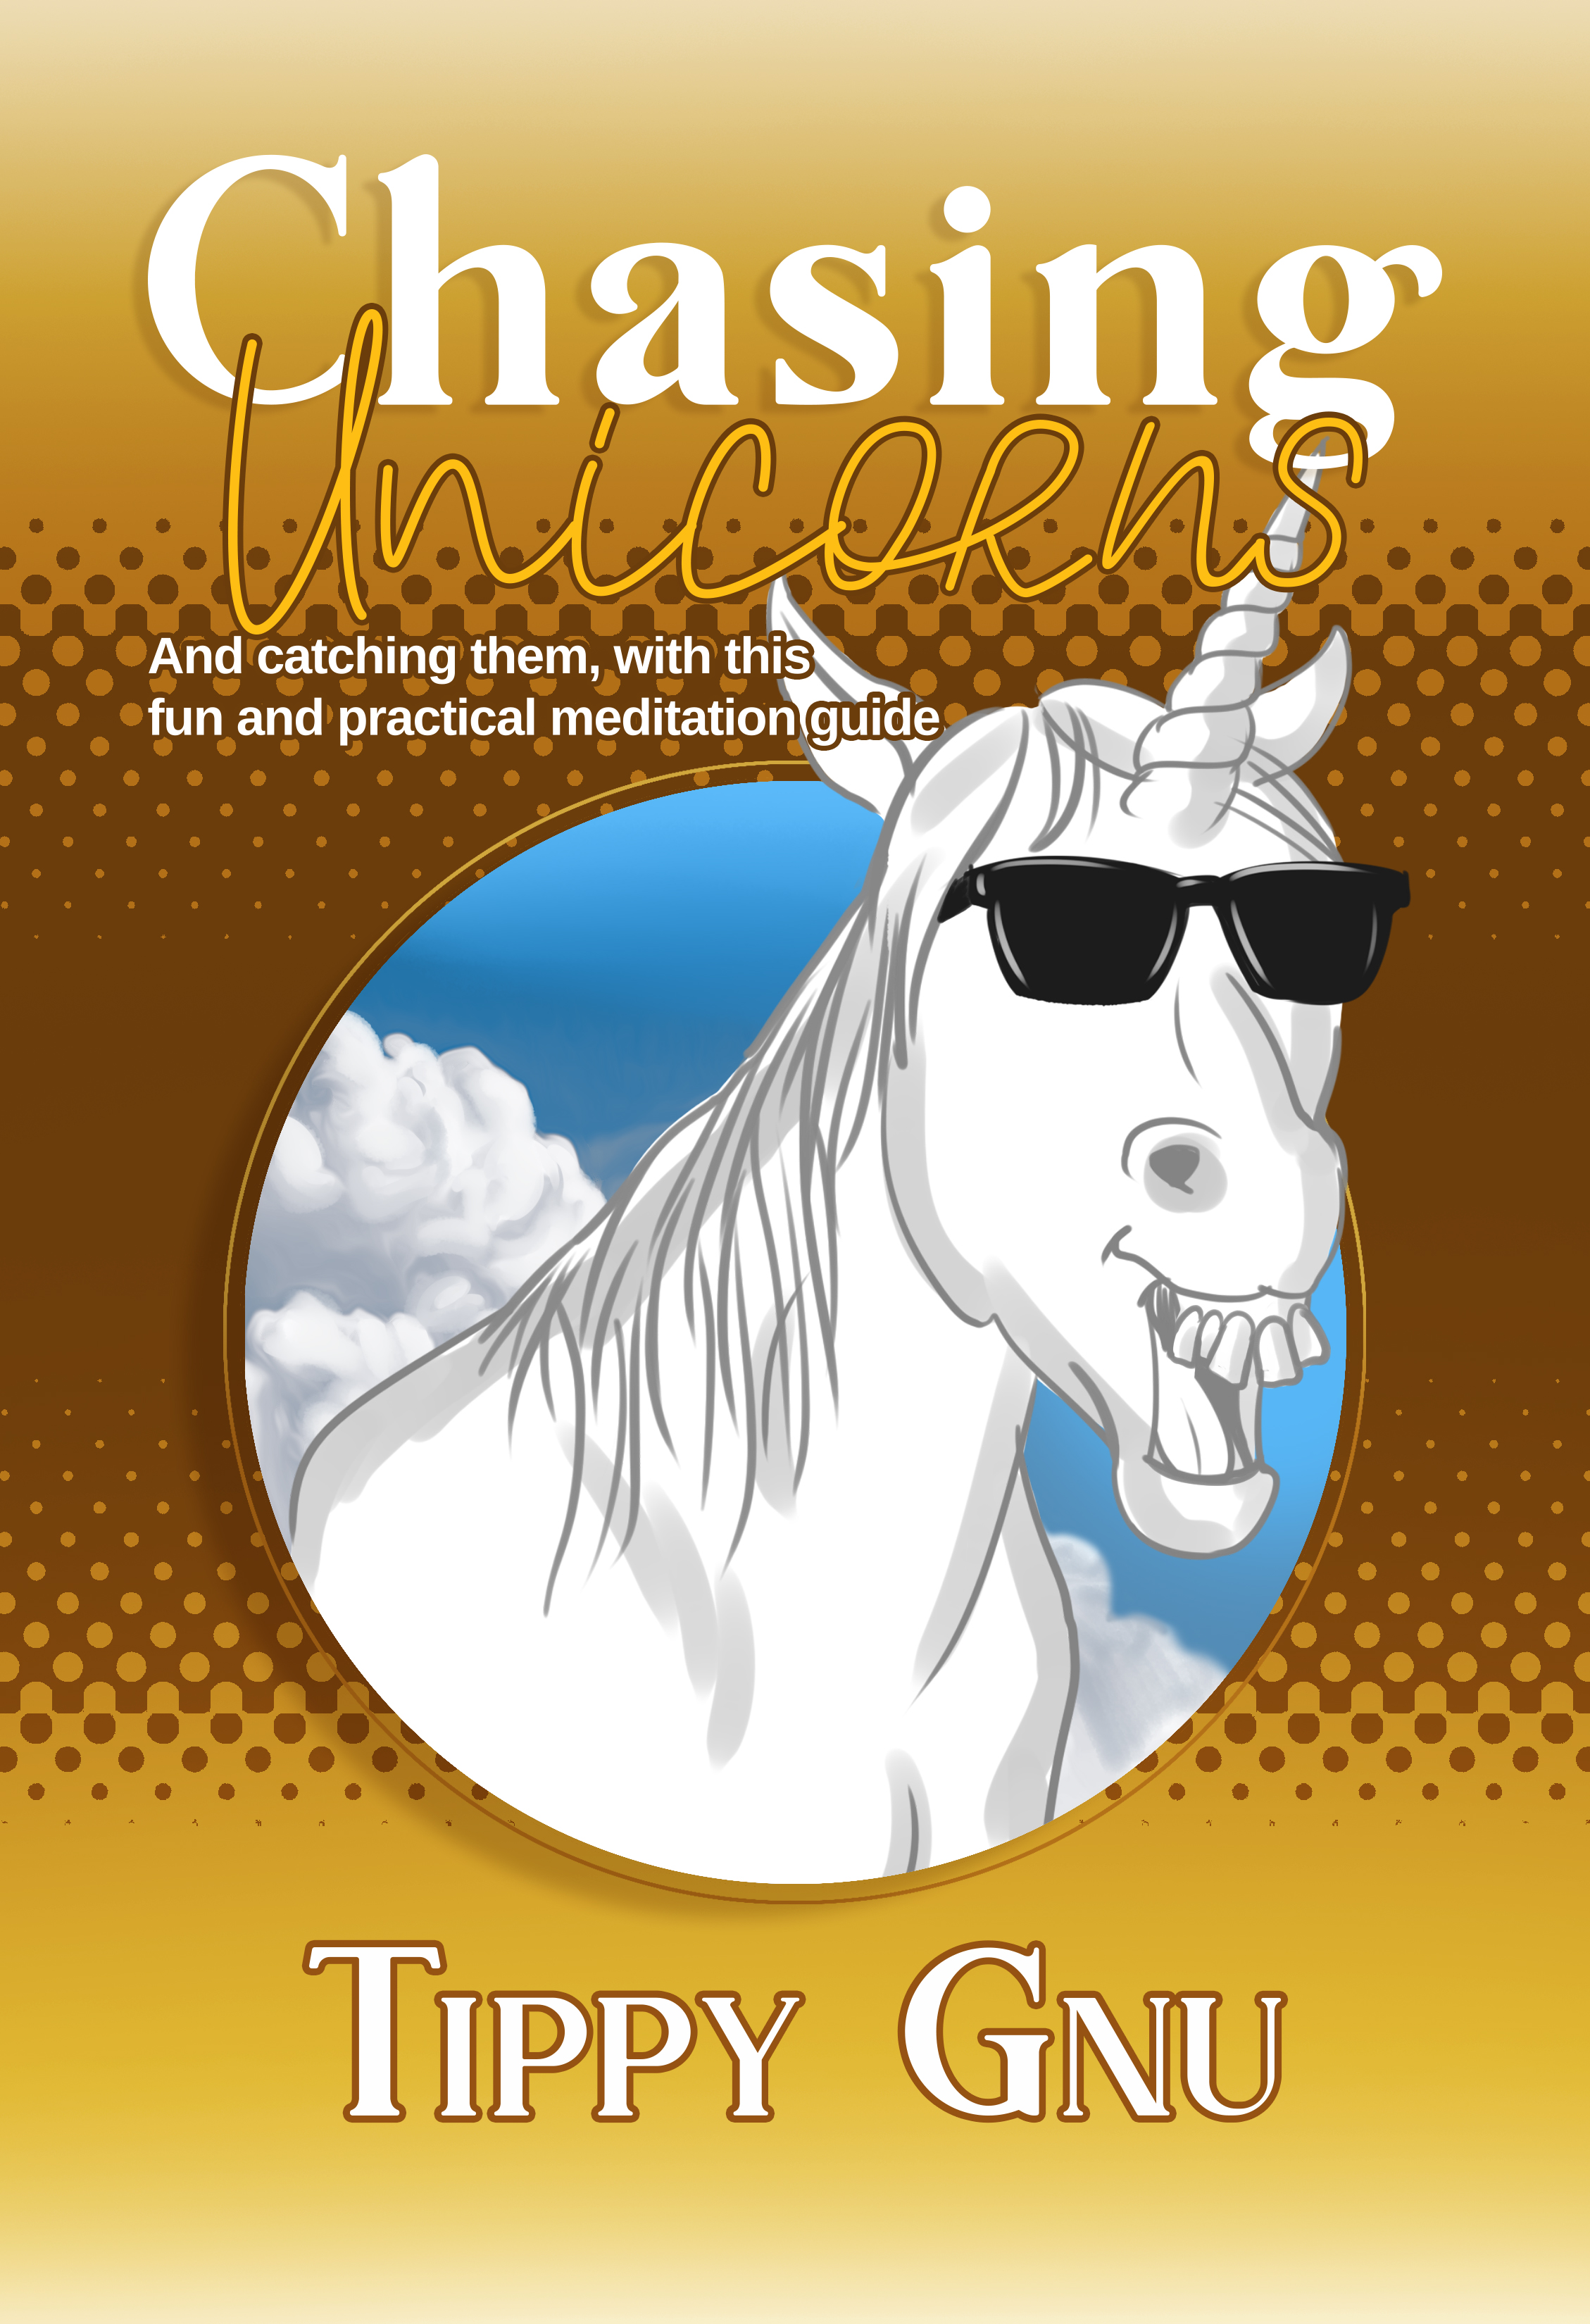 Chasing Unicorns: Chapter 7, On the Path of Unicorns, Part 1